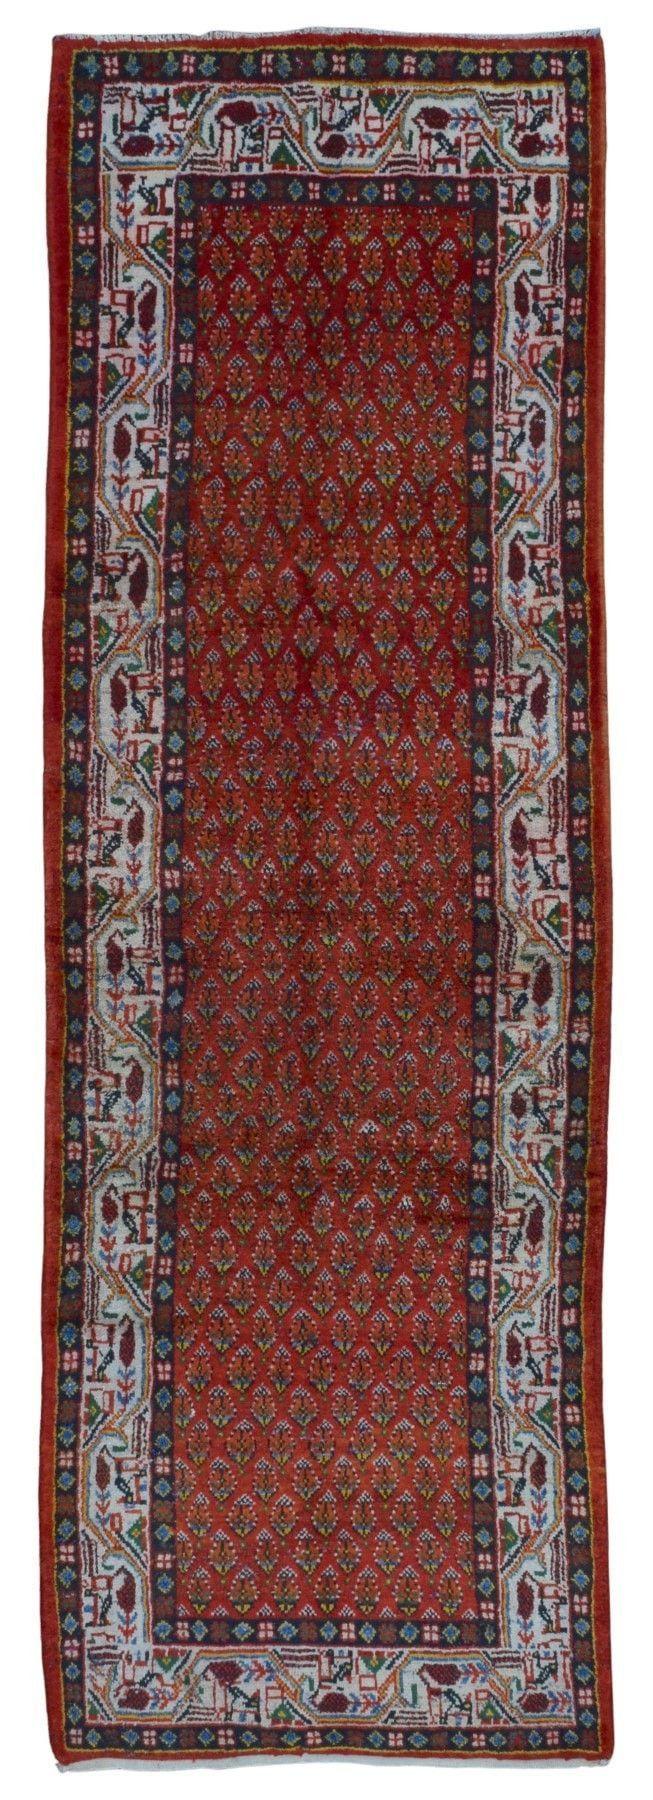 Semi-Antique Persian Hamadan Oriental Runner Rug 3'6X10'8